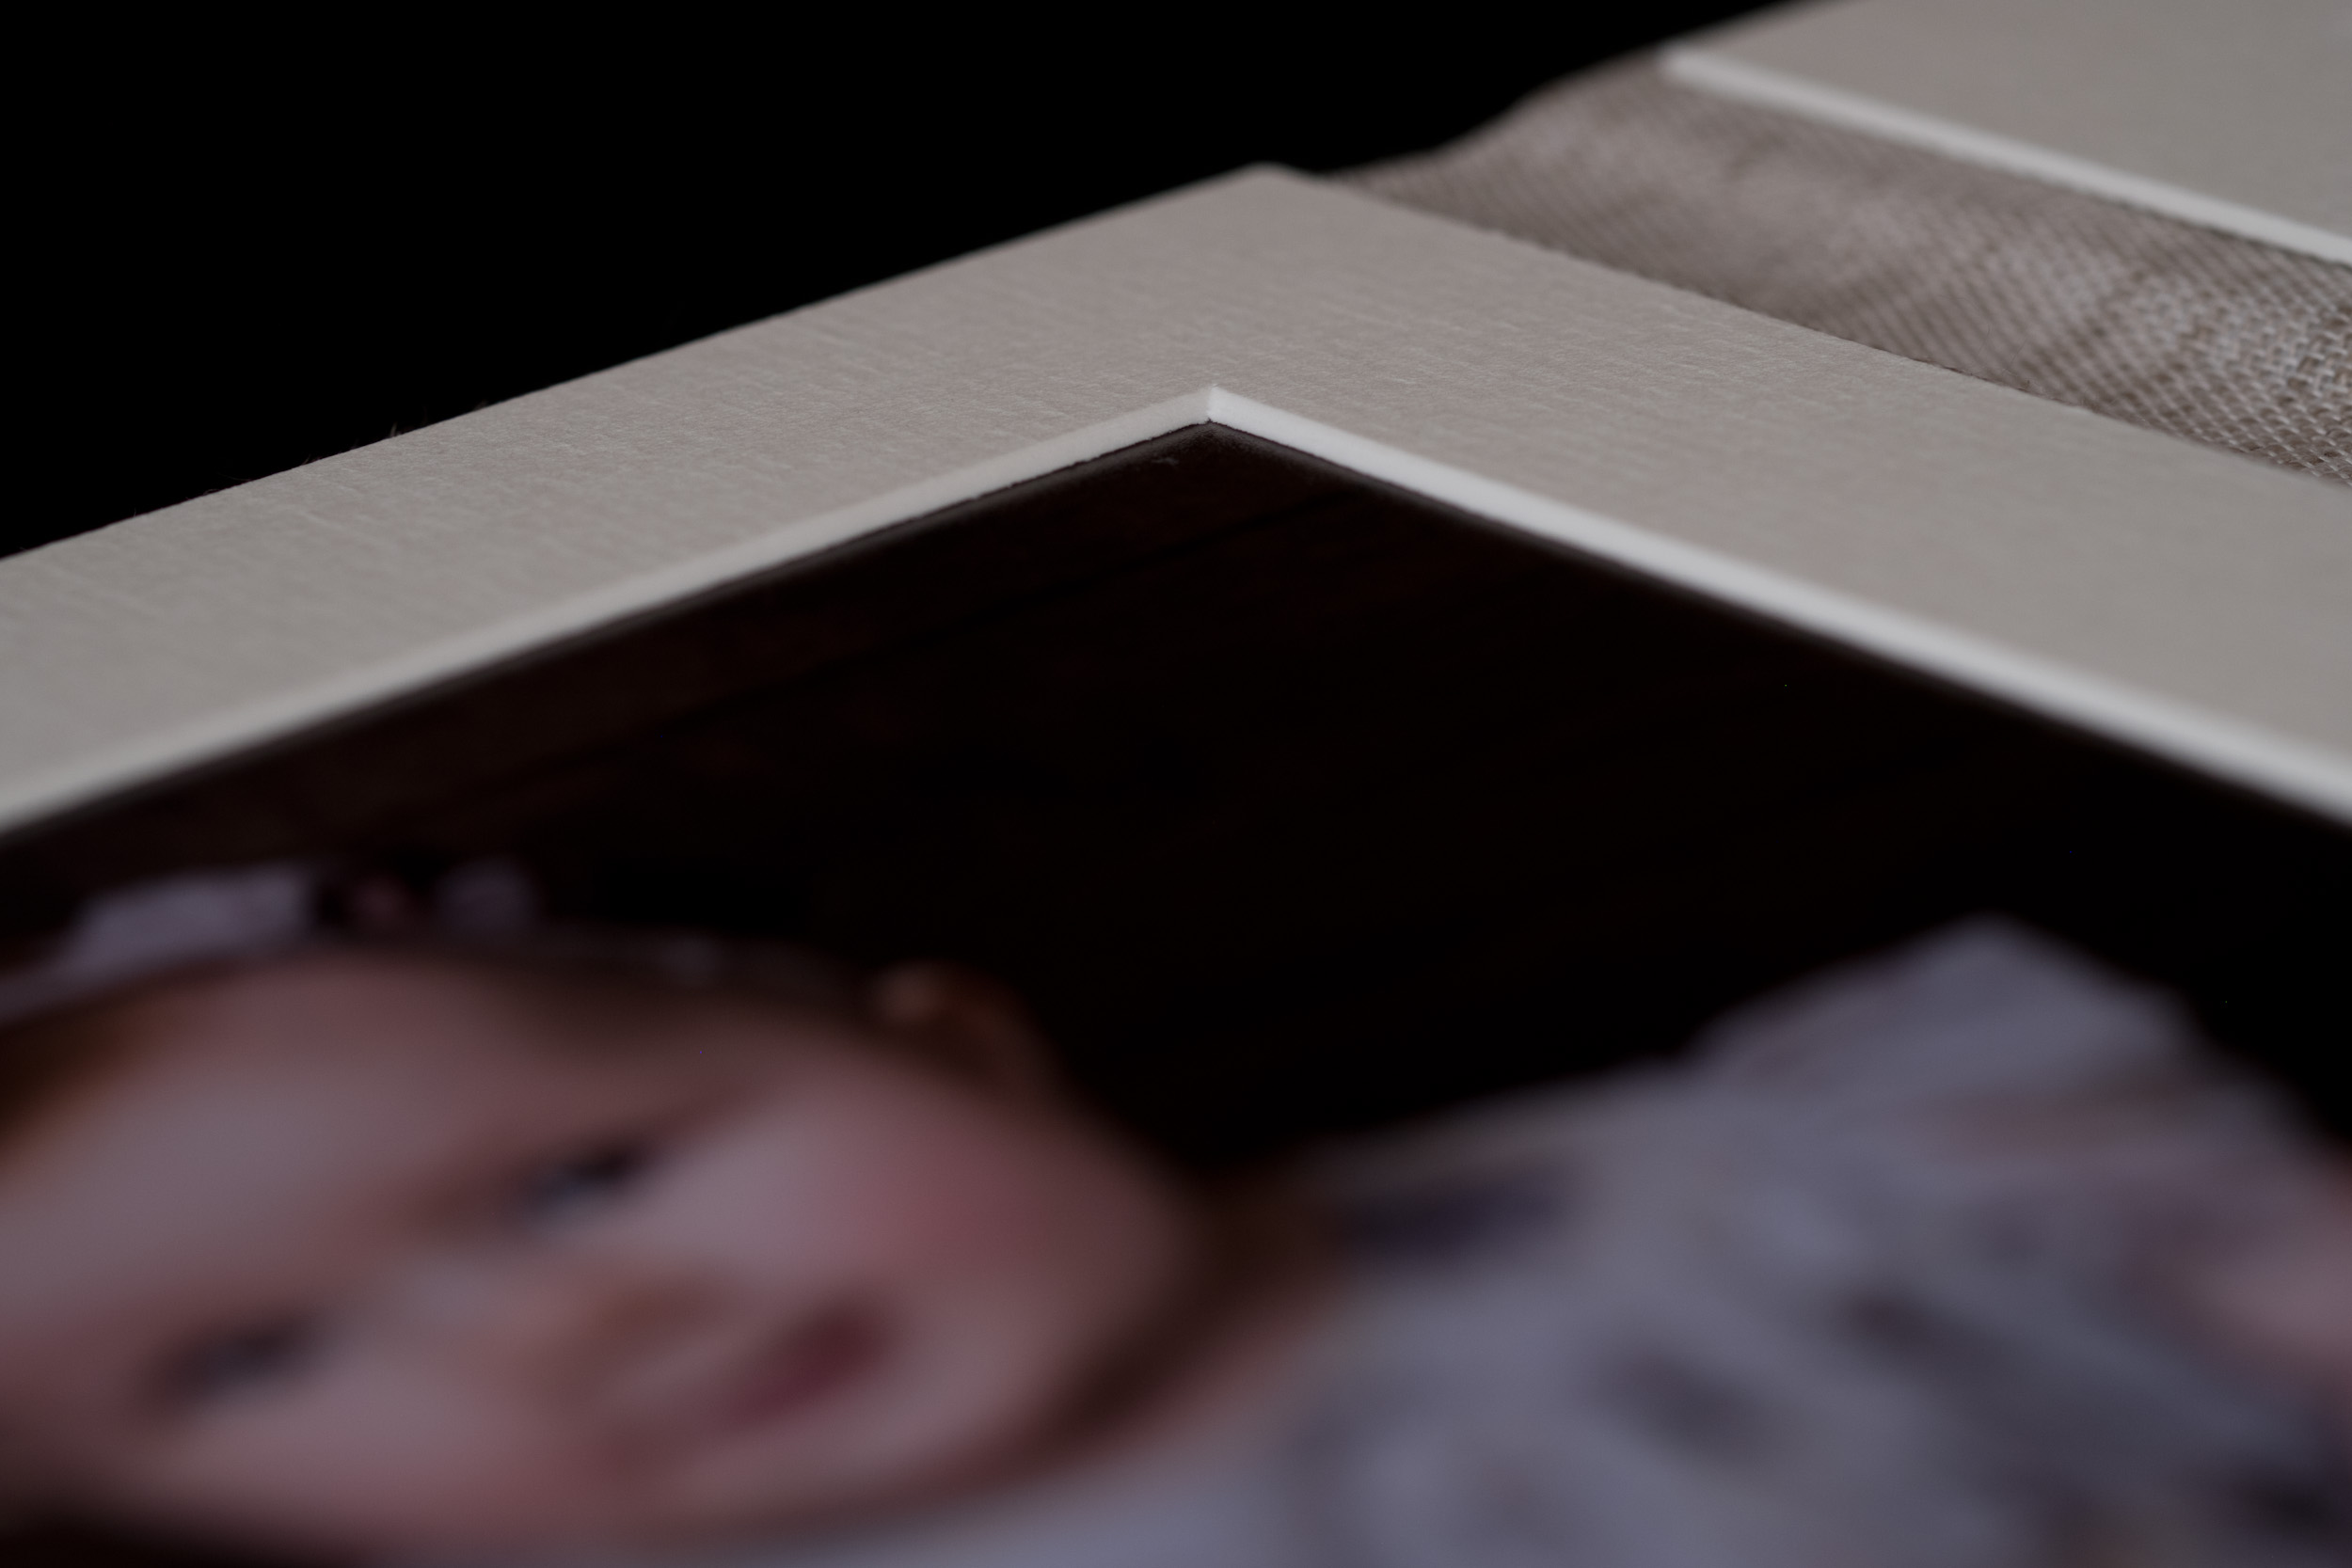 Newborn-Photography-Lincoln-Trio-Display-Folio-005.jpg